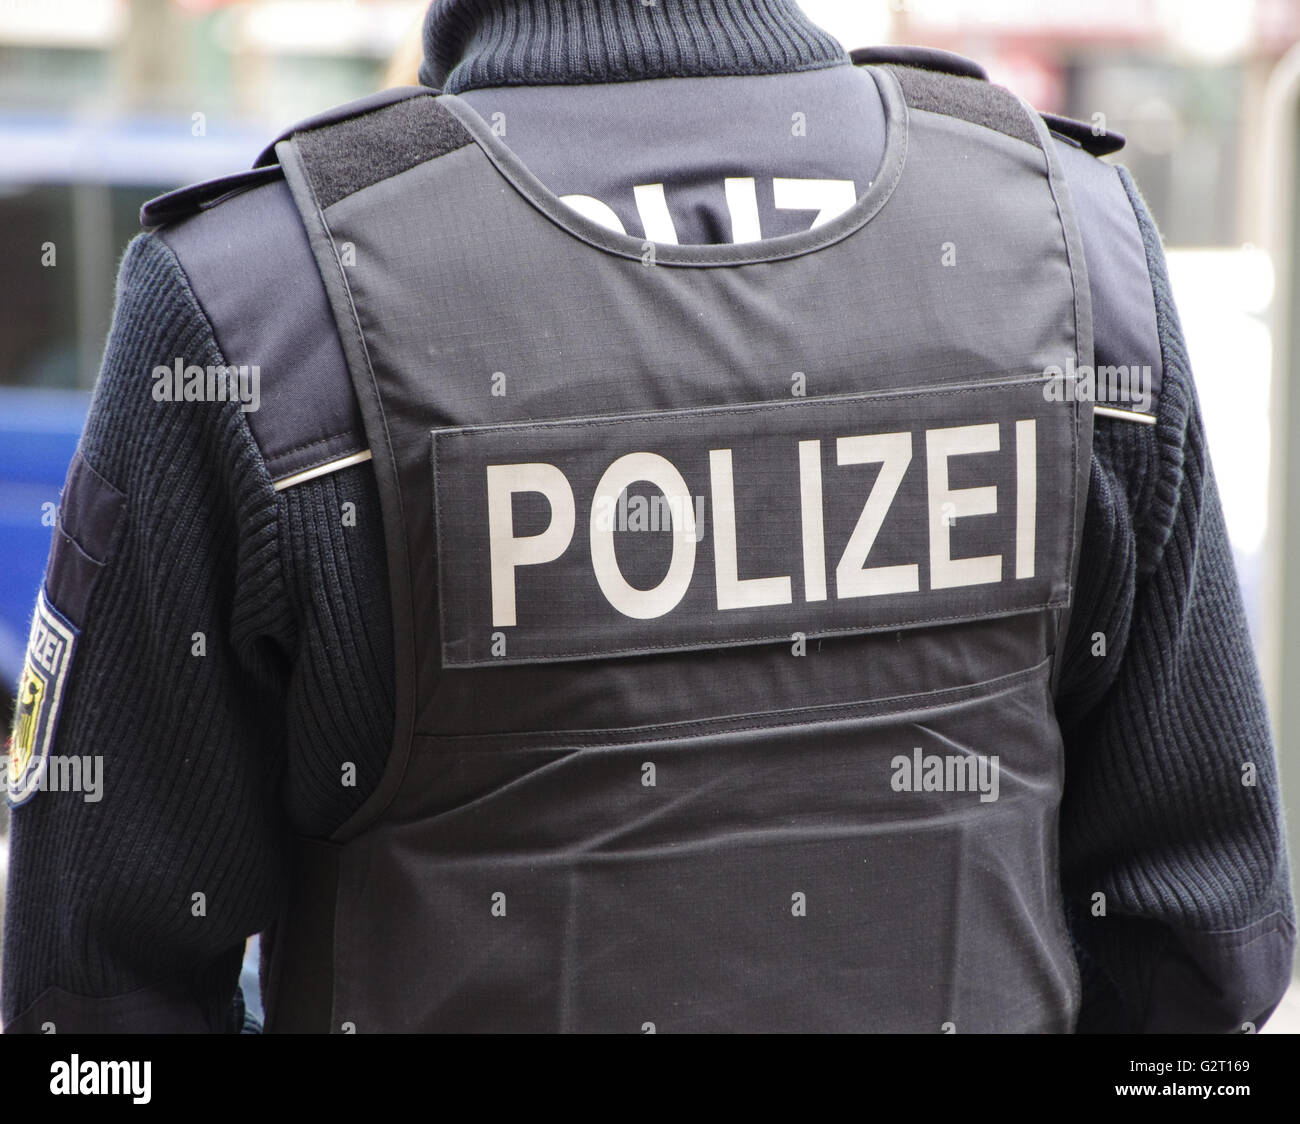 A Police man in Frankfurt am Main railway station. Stock Photo